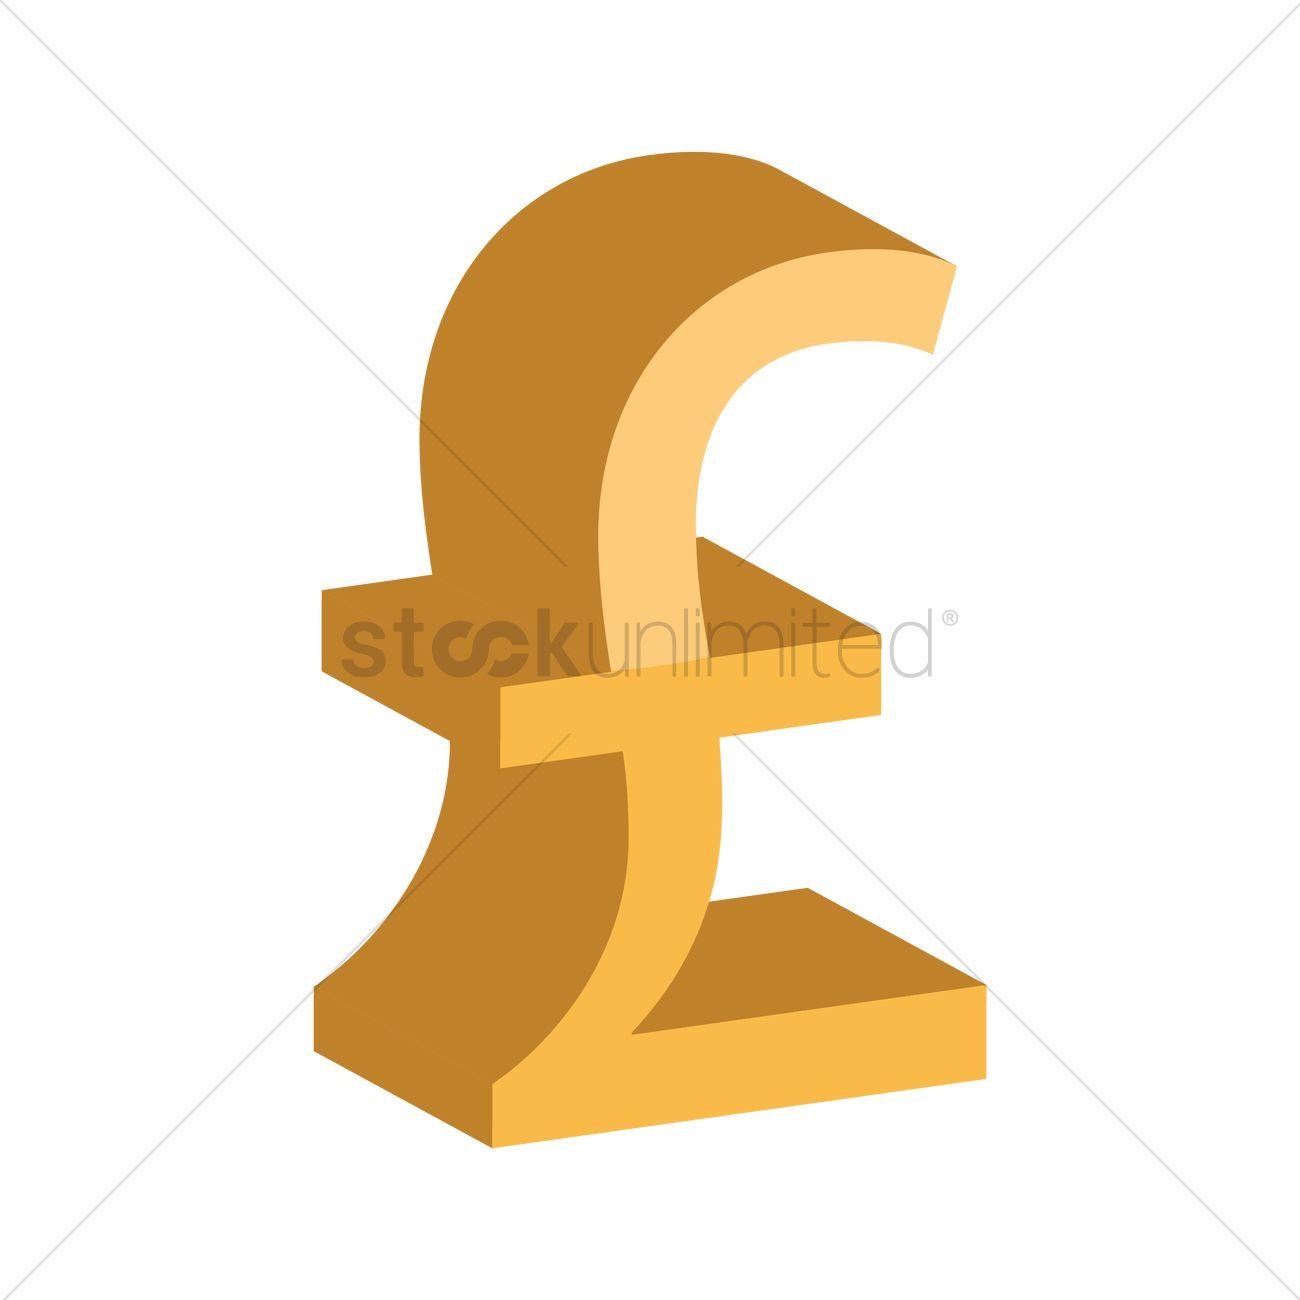 Uk Pound Sterling Symbol Vector Image 1866783 Stockunlimited